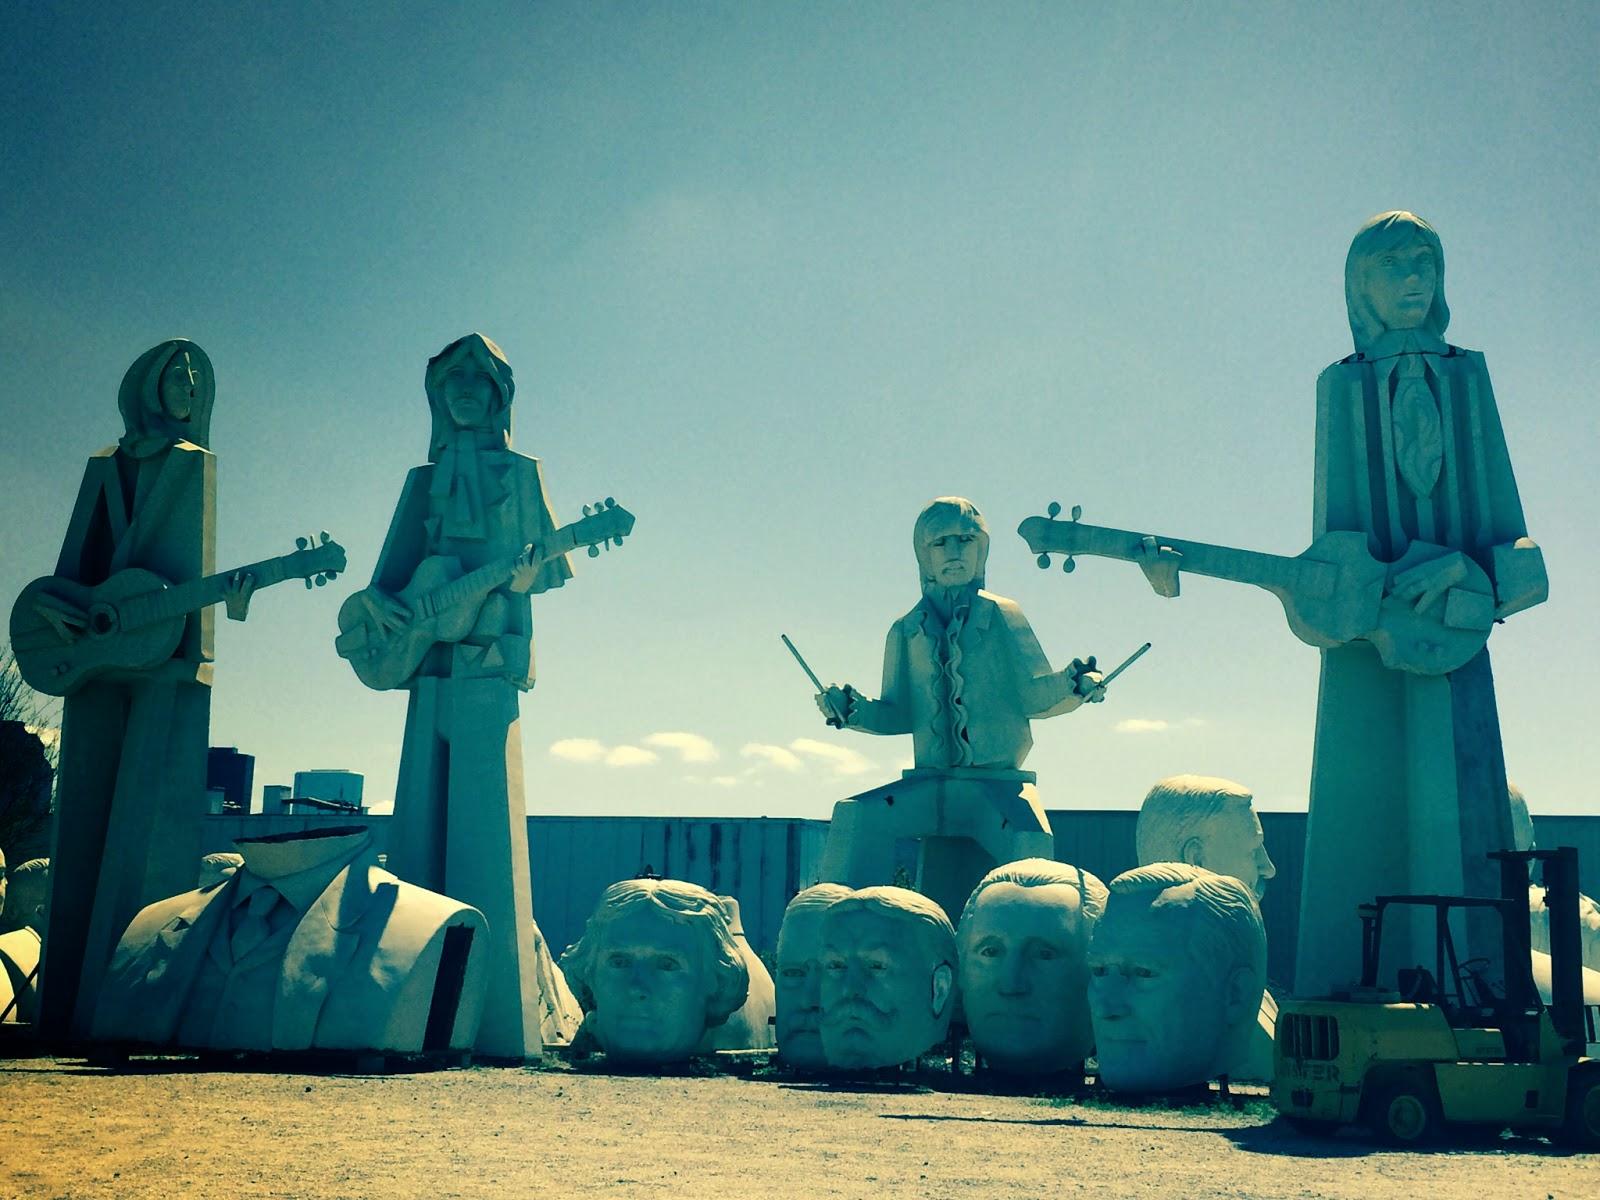 Houston Beatles Statues Trendy in Texas